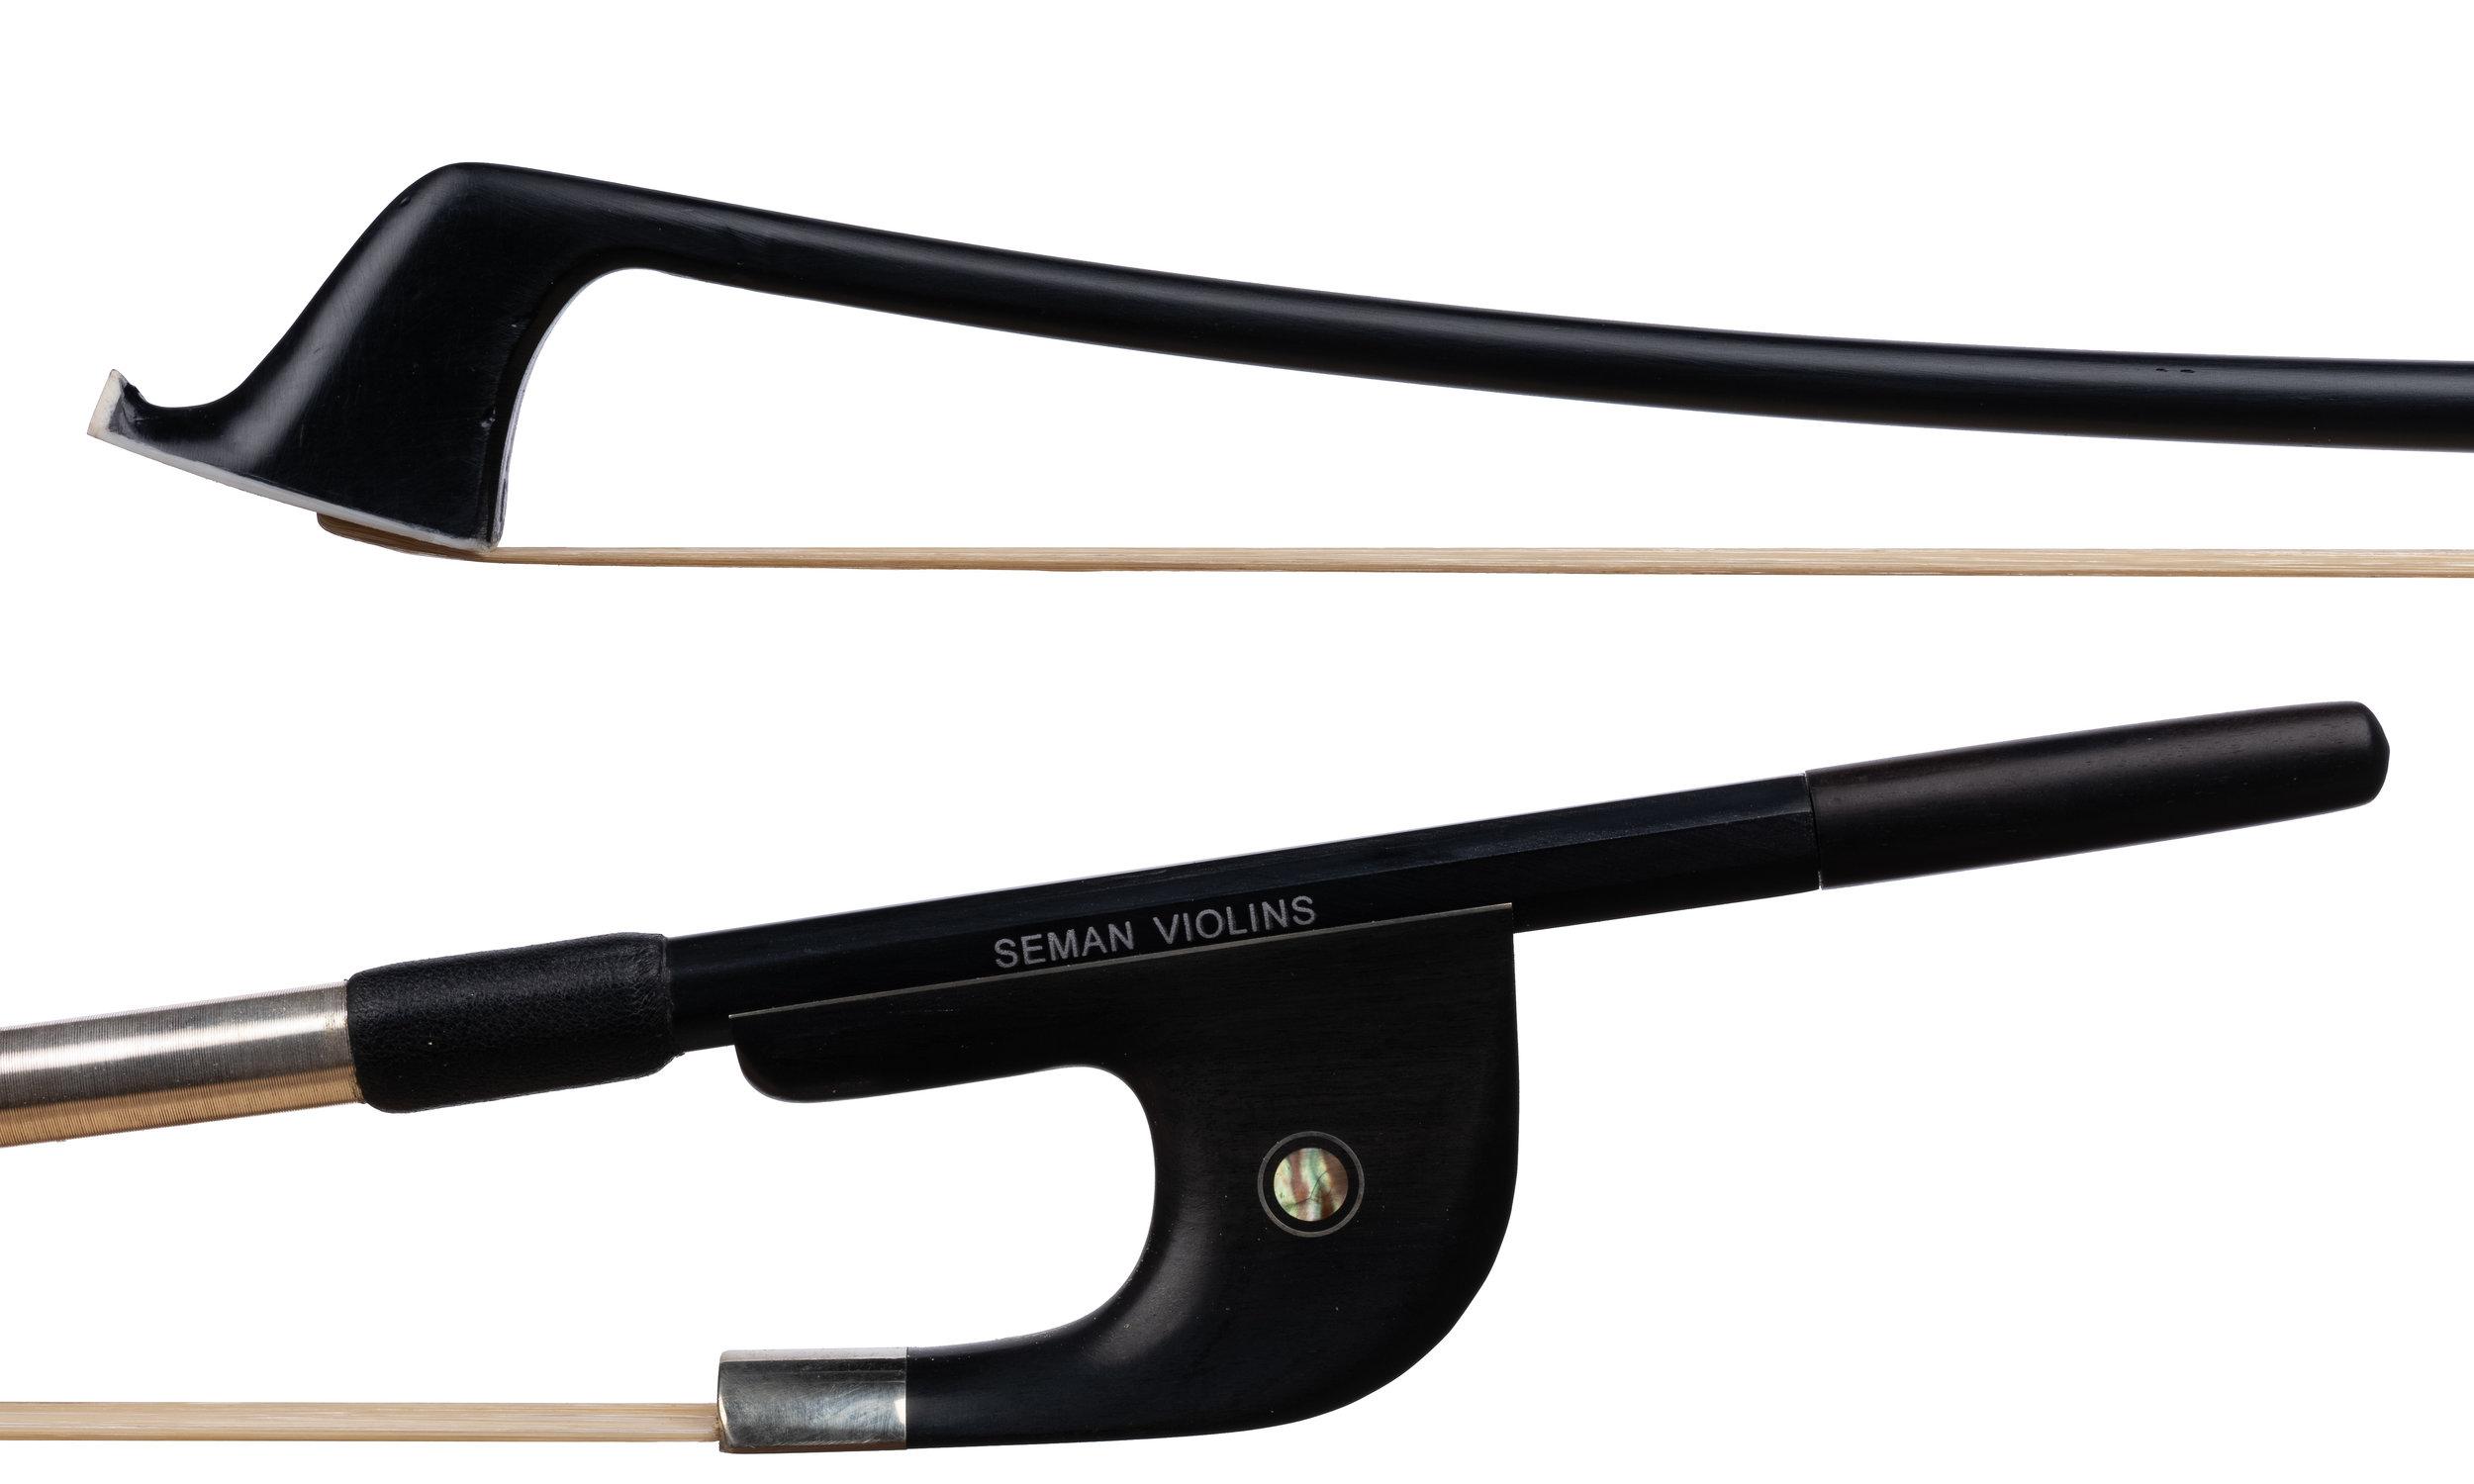 Seman Violins - Nickel and ebony-mounted